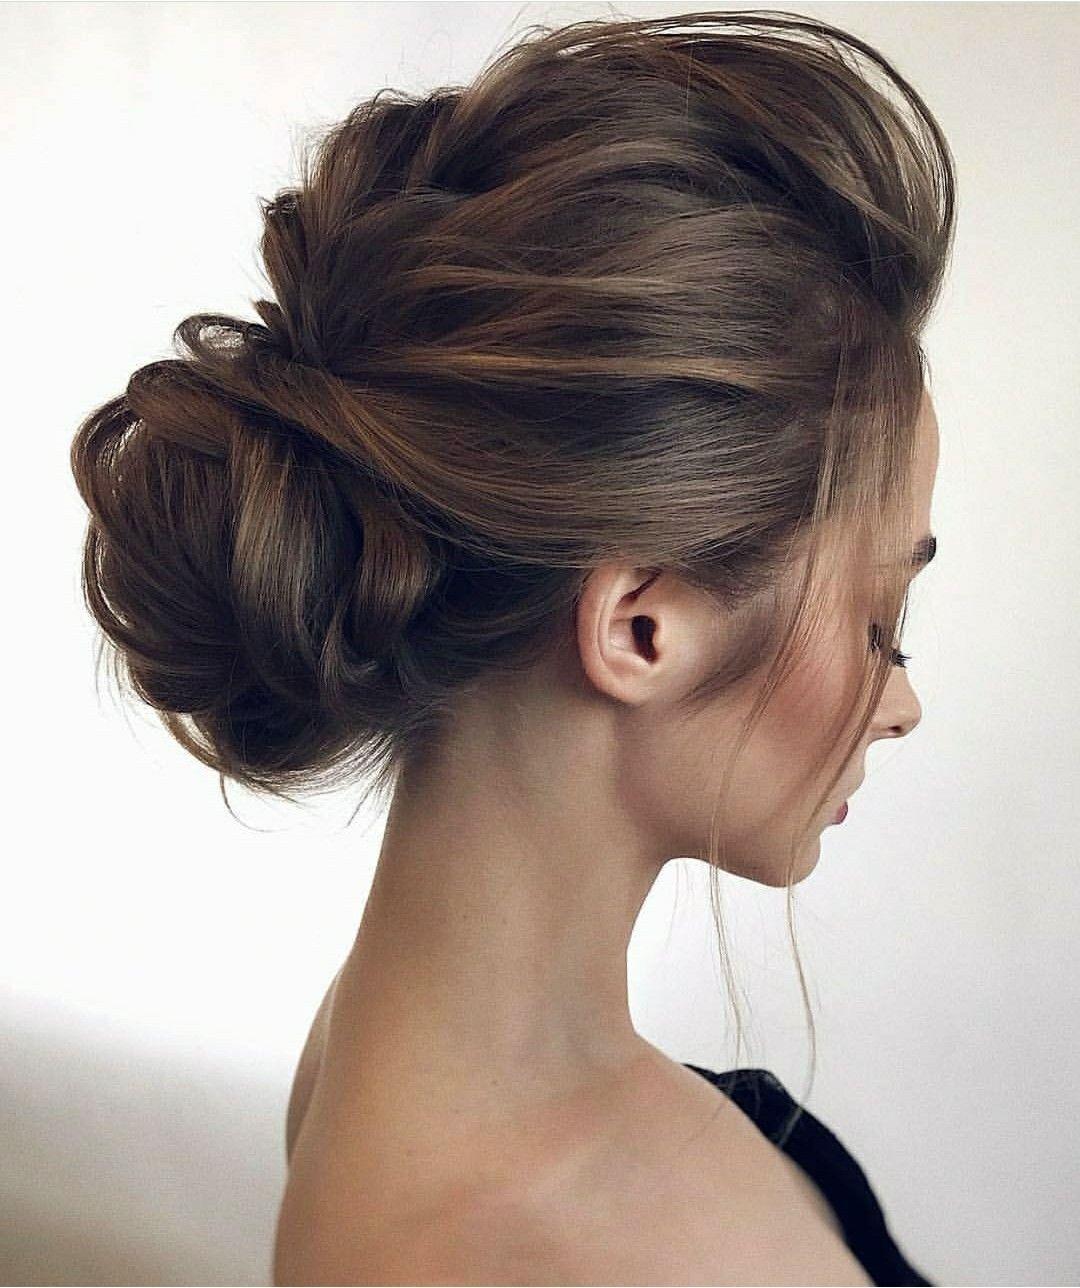 ensede topuz   hairstyles in 2019   chignon hair, wedding